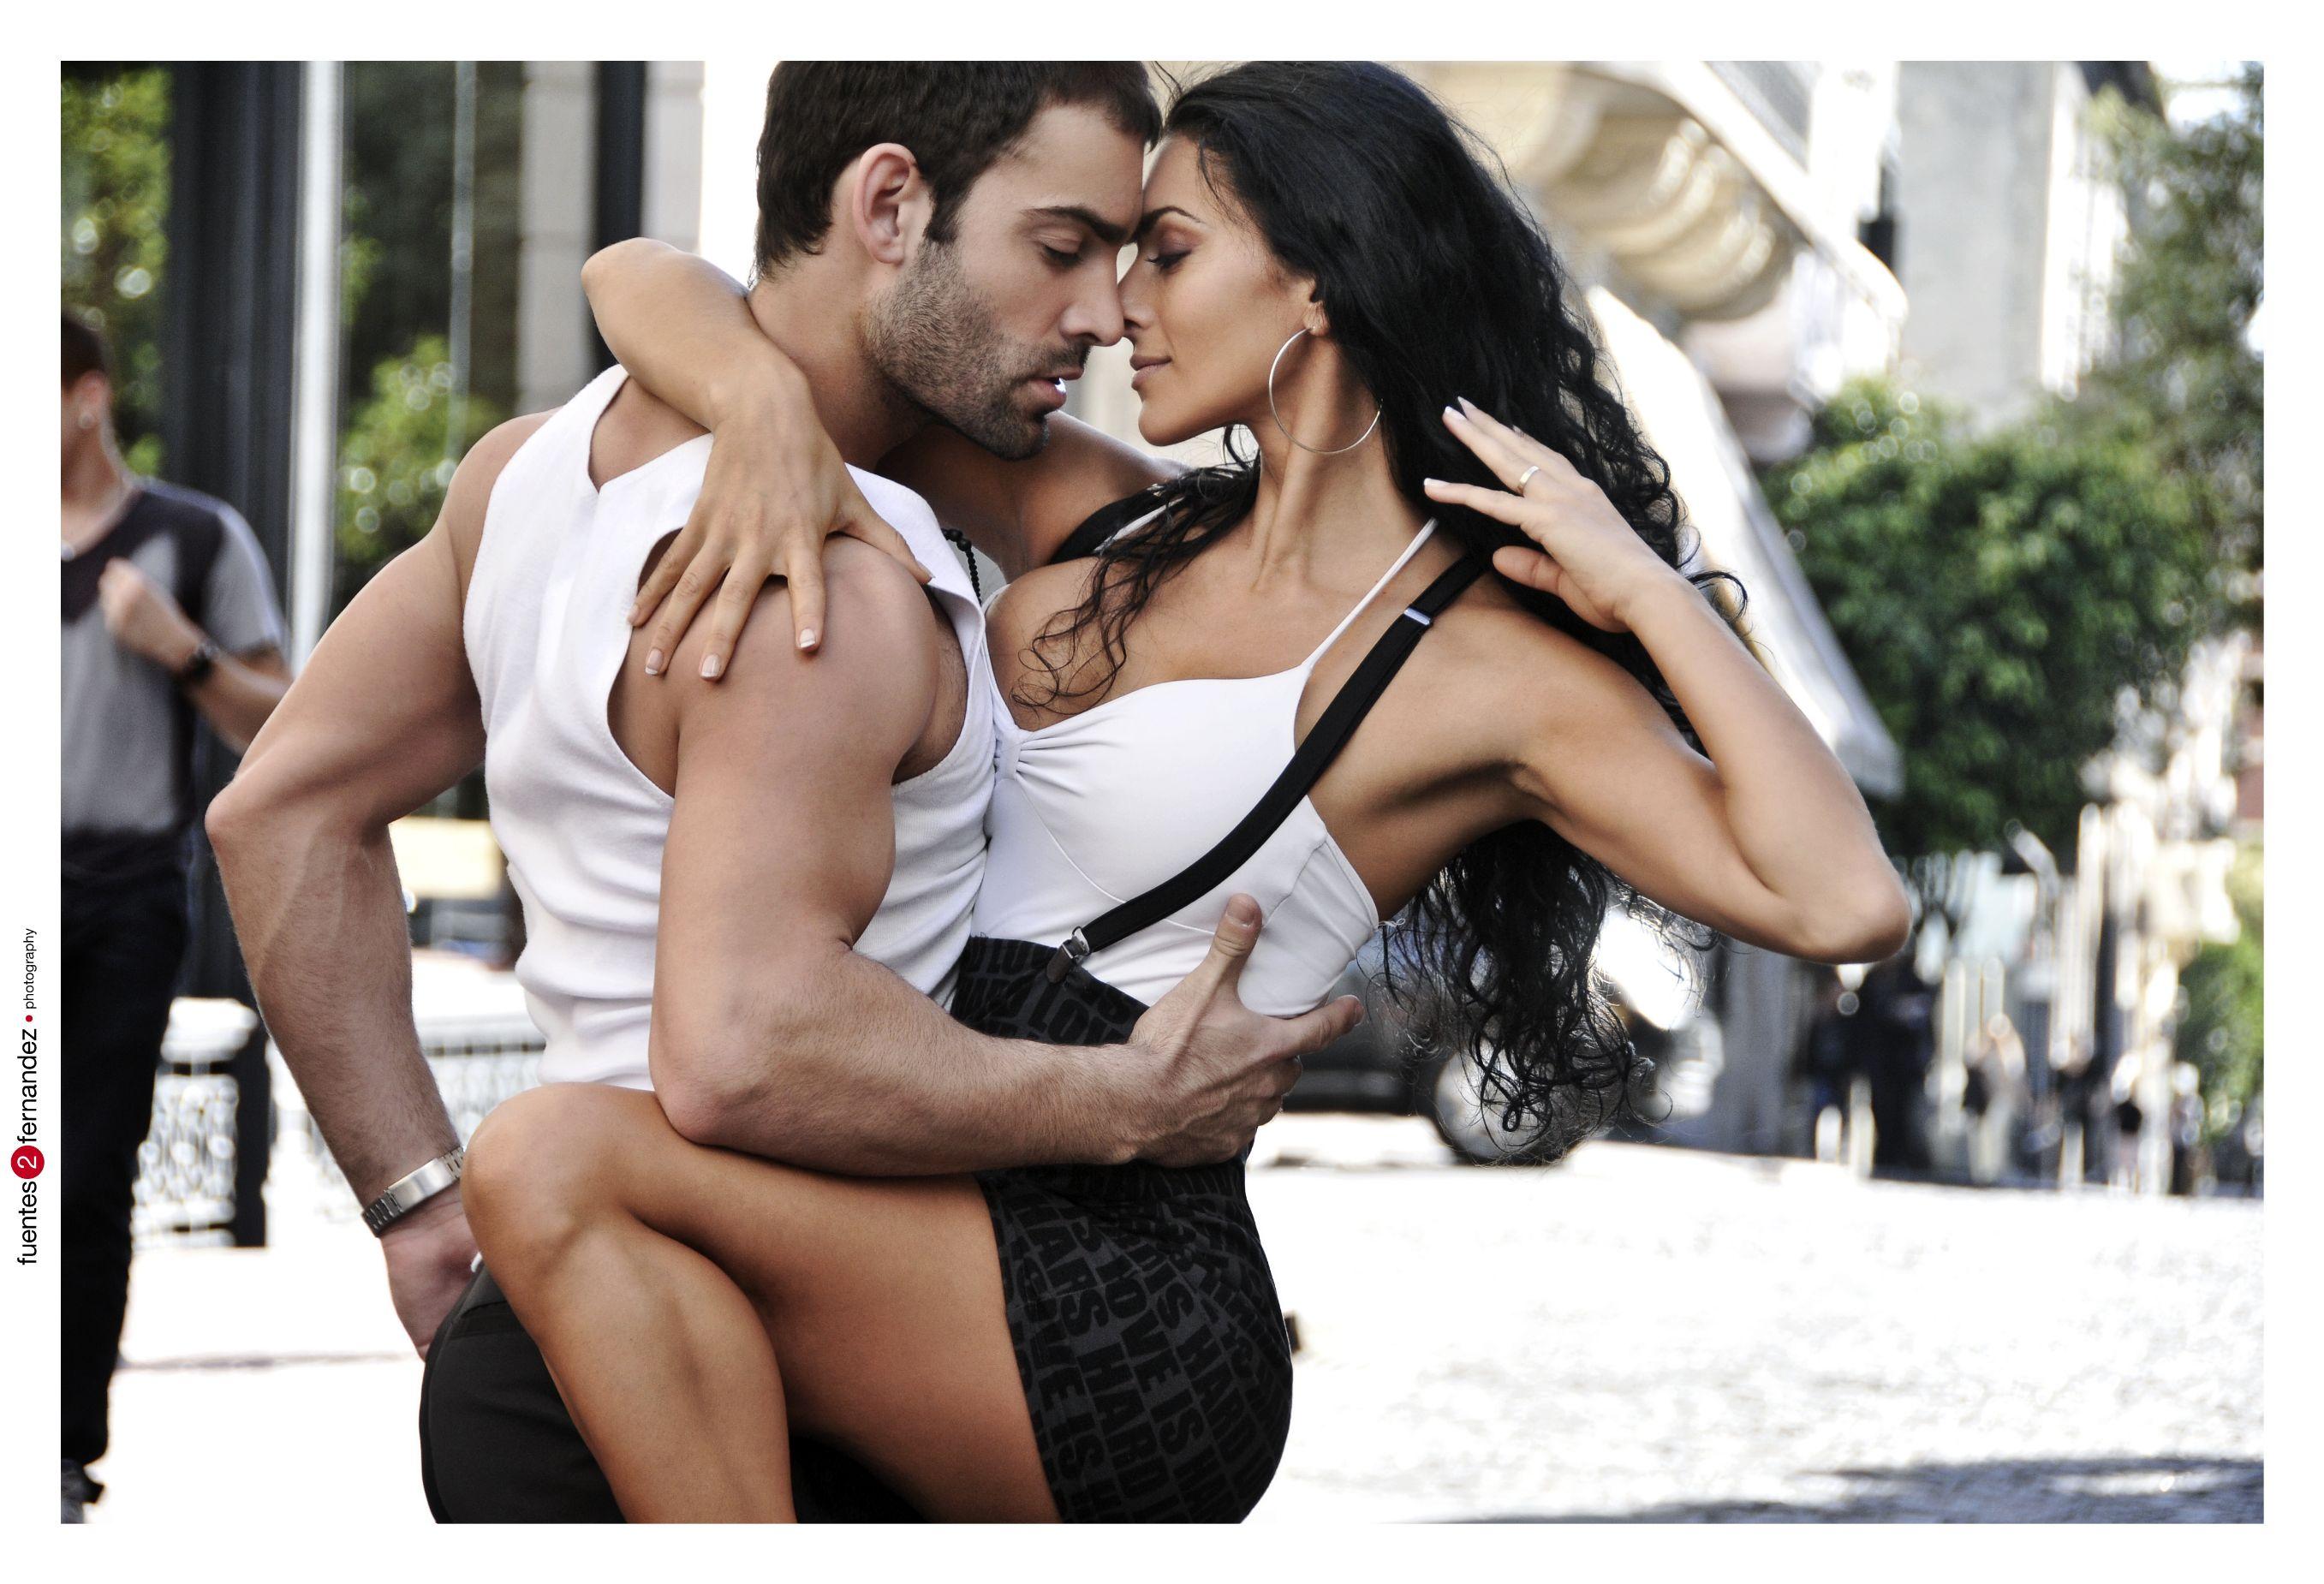 17. Tango dancers in Buenos Aires, Argentina